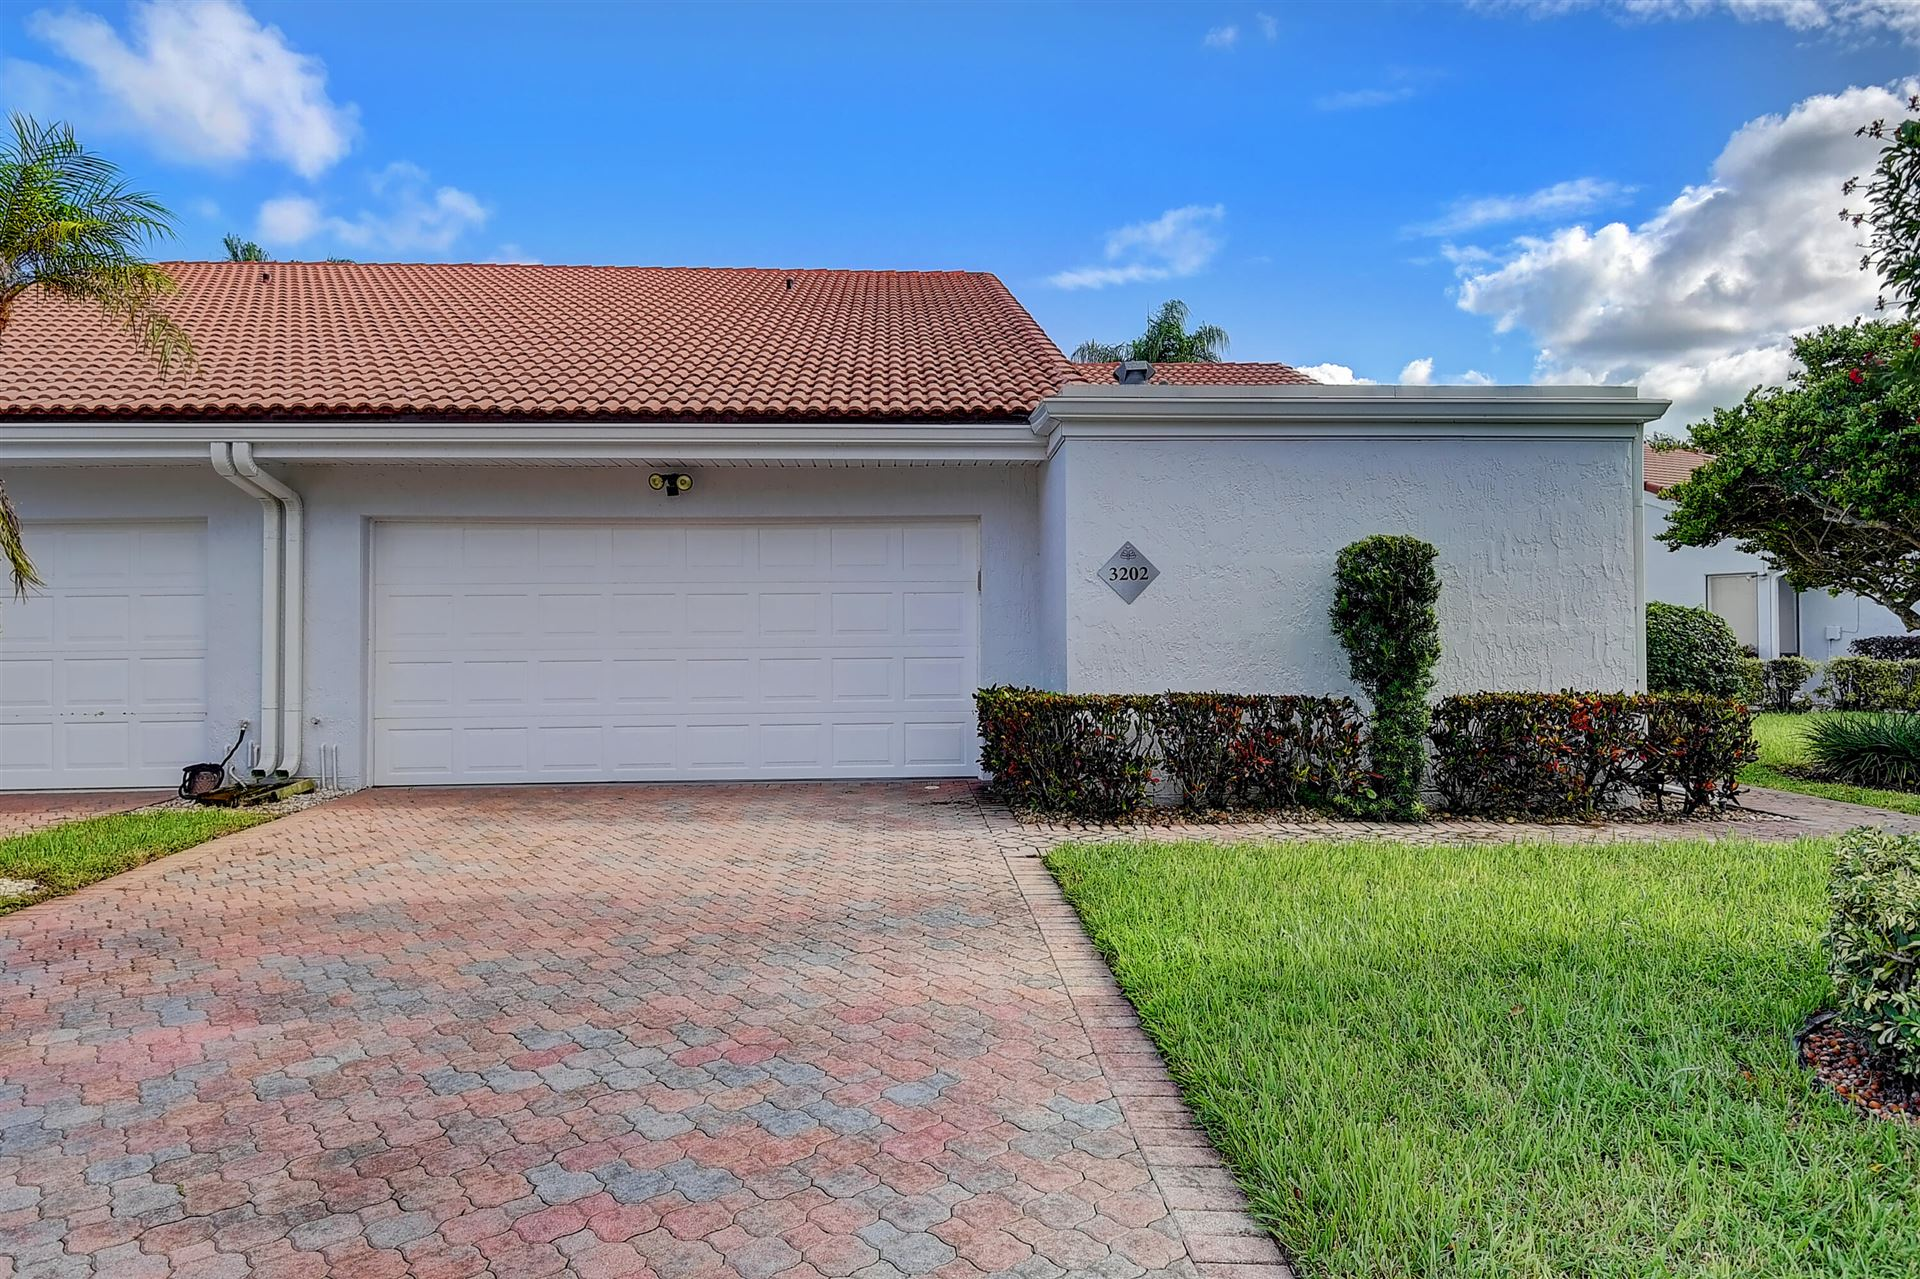 19680 Sawgrass Drive #3202, Boca Raton, FL 33434 - #: RX-10749999